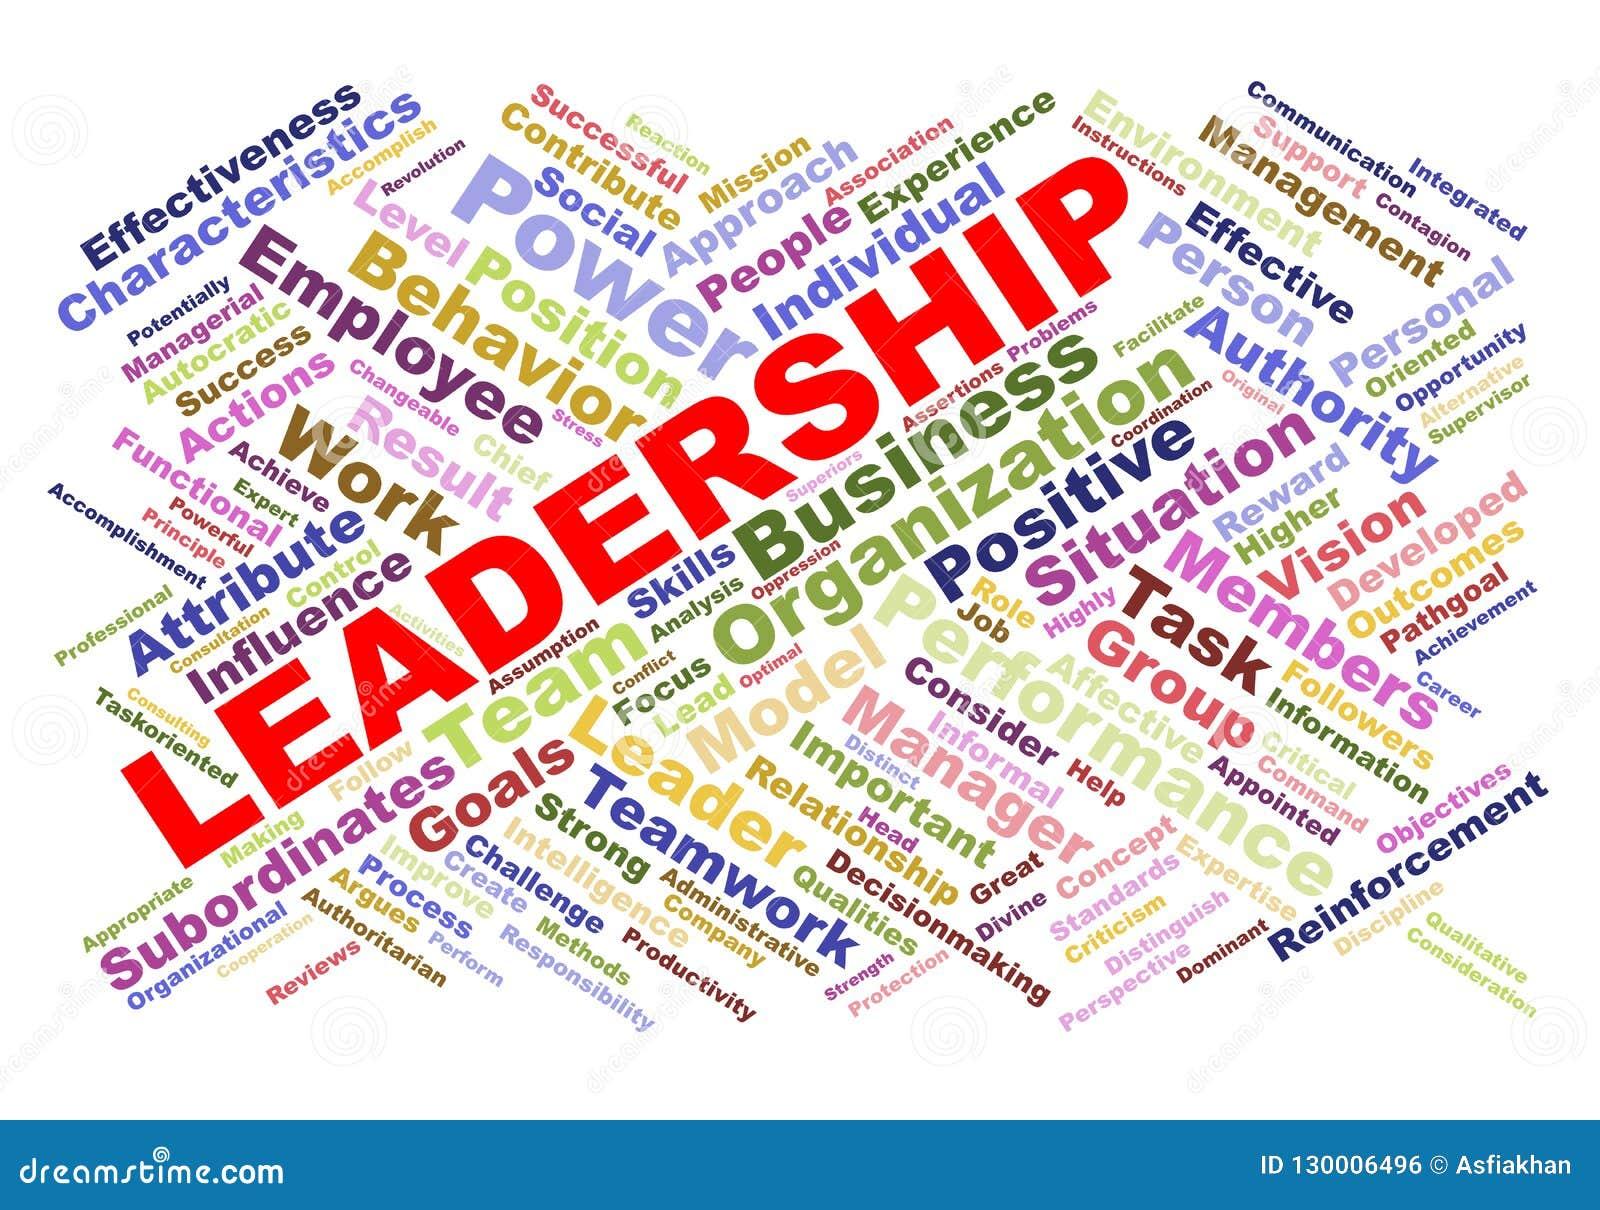 Wordcloud leader concept stock illustration  Illustration of